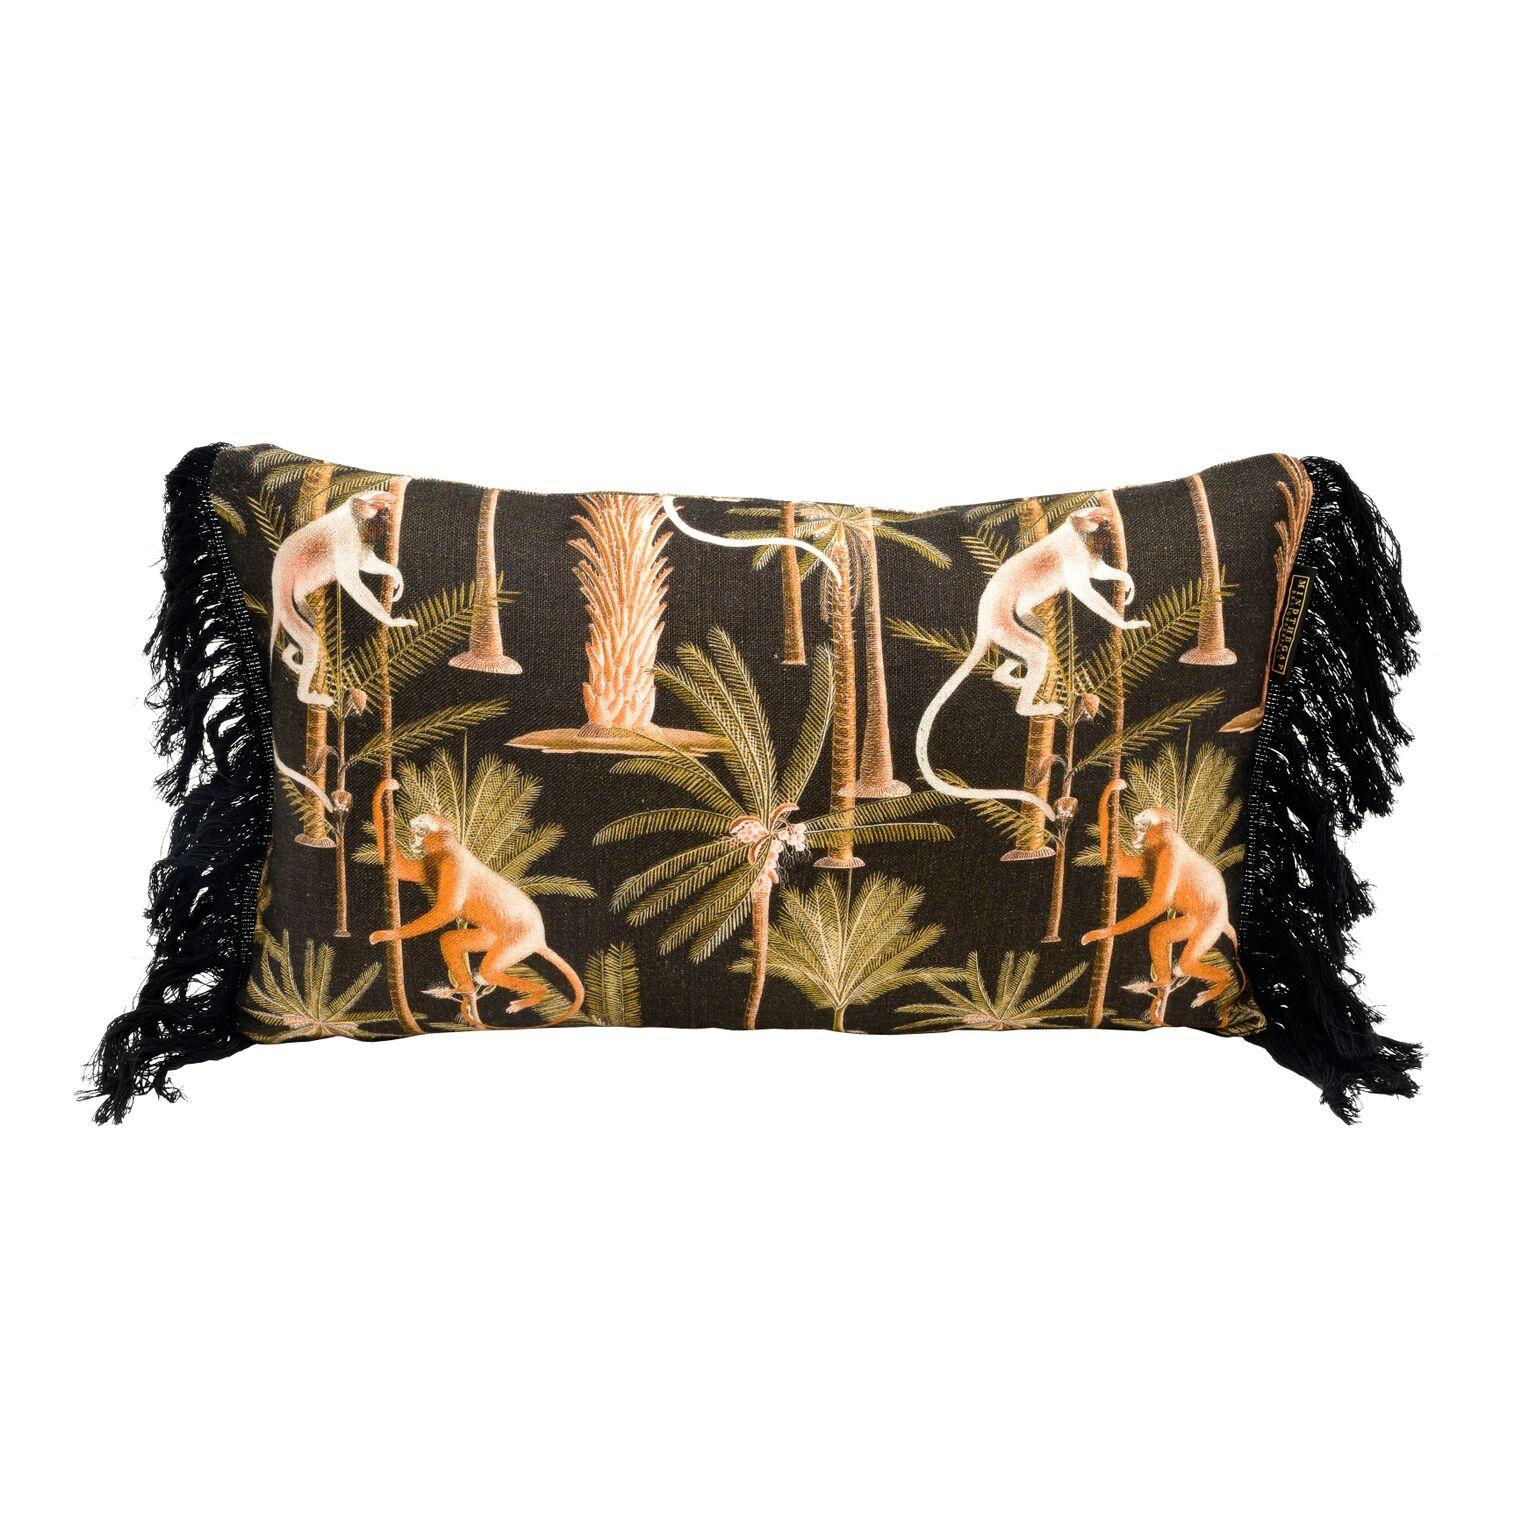 Perna decorativa Barbados Anthracite, L50xl30 cm poza